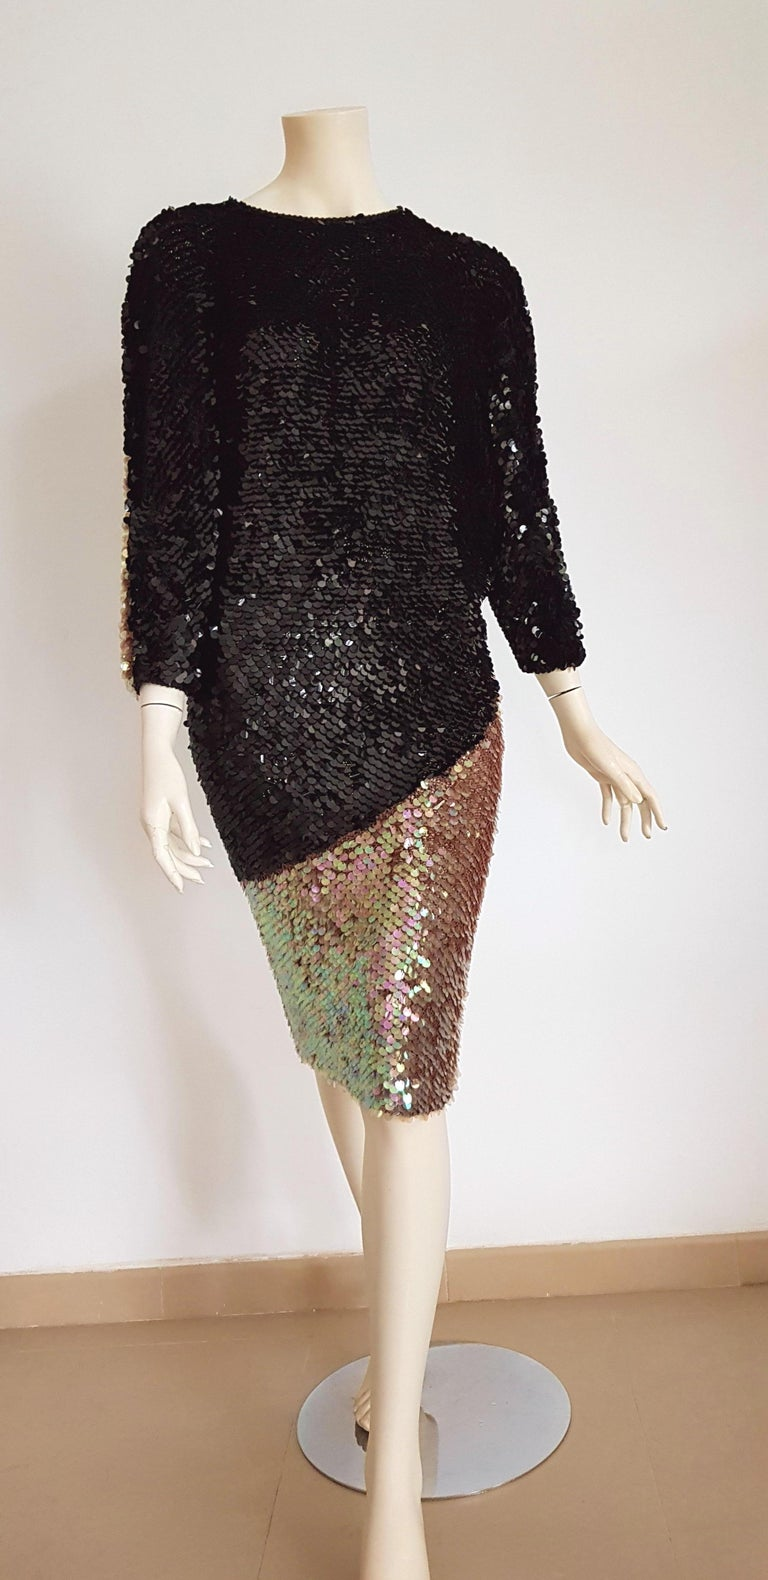 Chanel Quot New Quot Haute Couture Swarovski Sequins On Knit Black